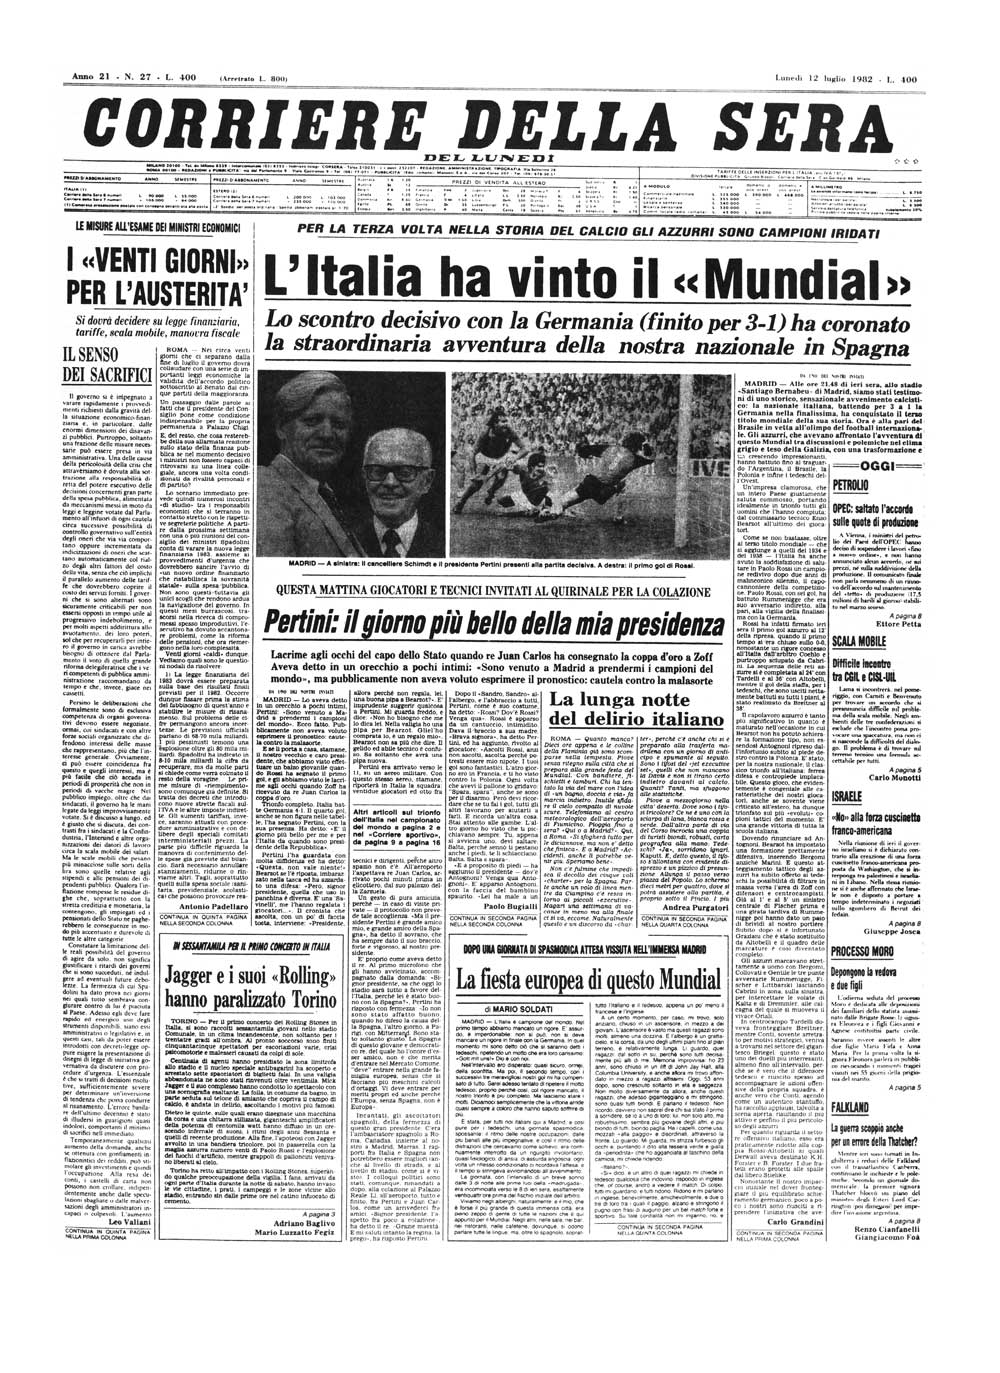 Corriere Della Sera Il Corriere Della Sera Del 12 Luglio